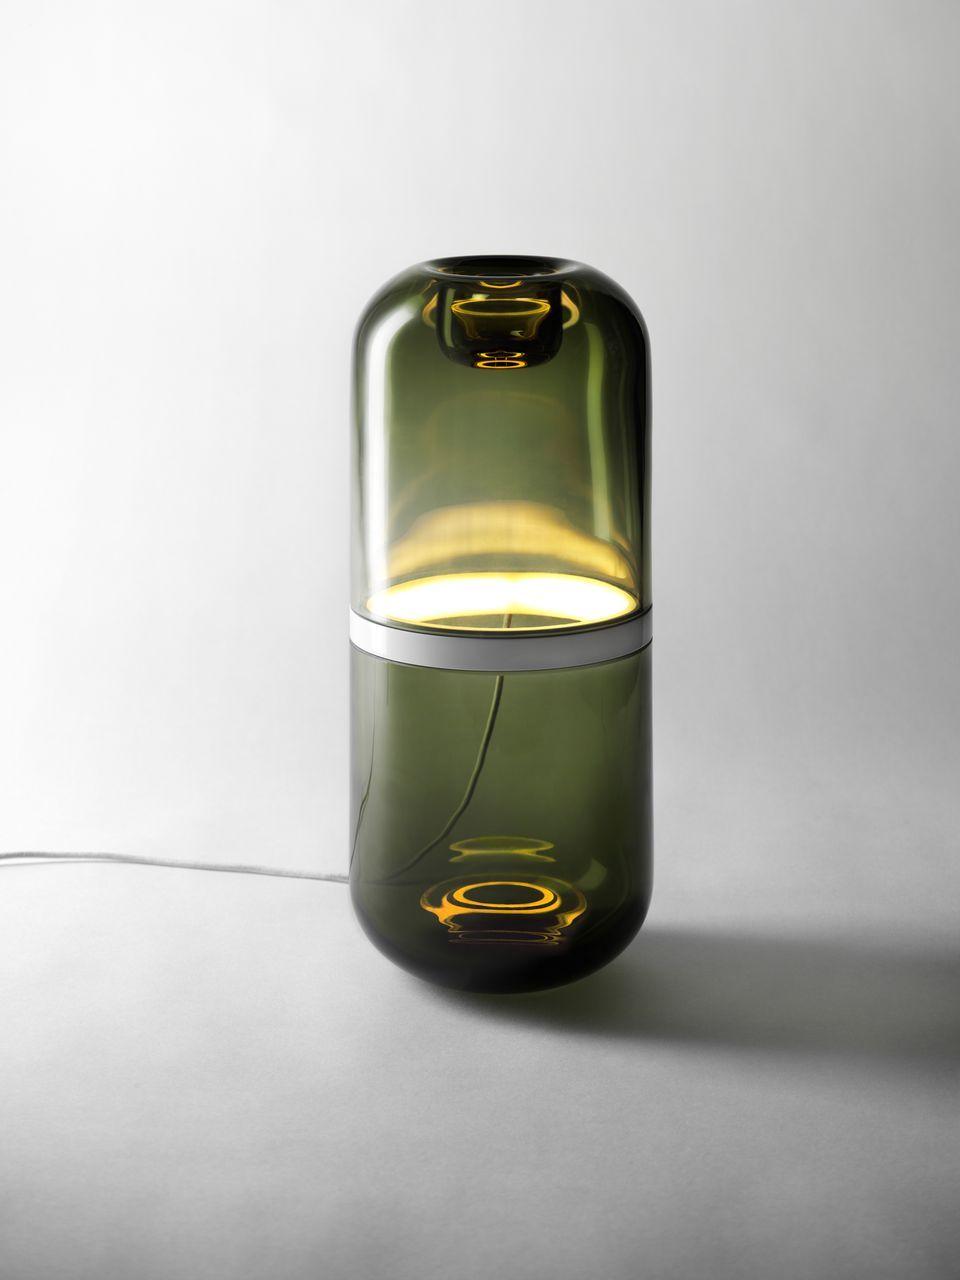 DEMI LAMP LARGE GREENGREEN | Glaslampen, Lampendesign